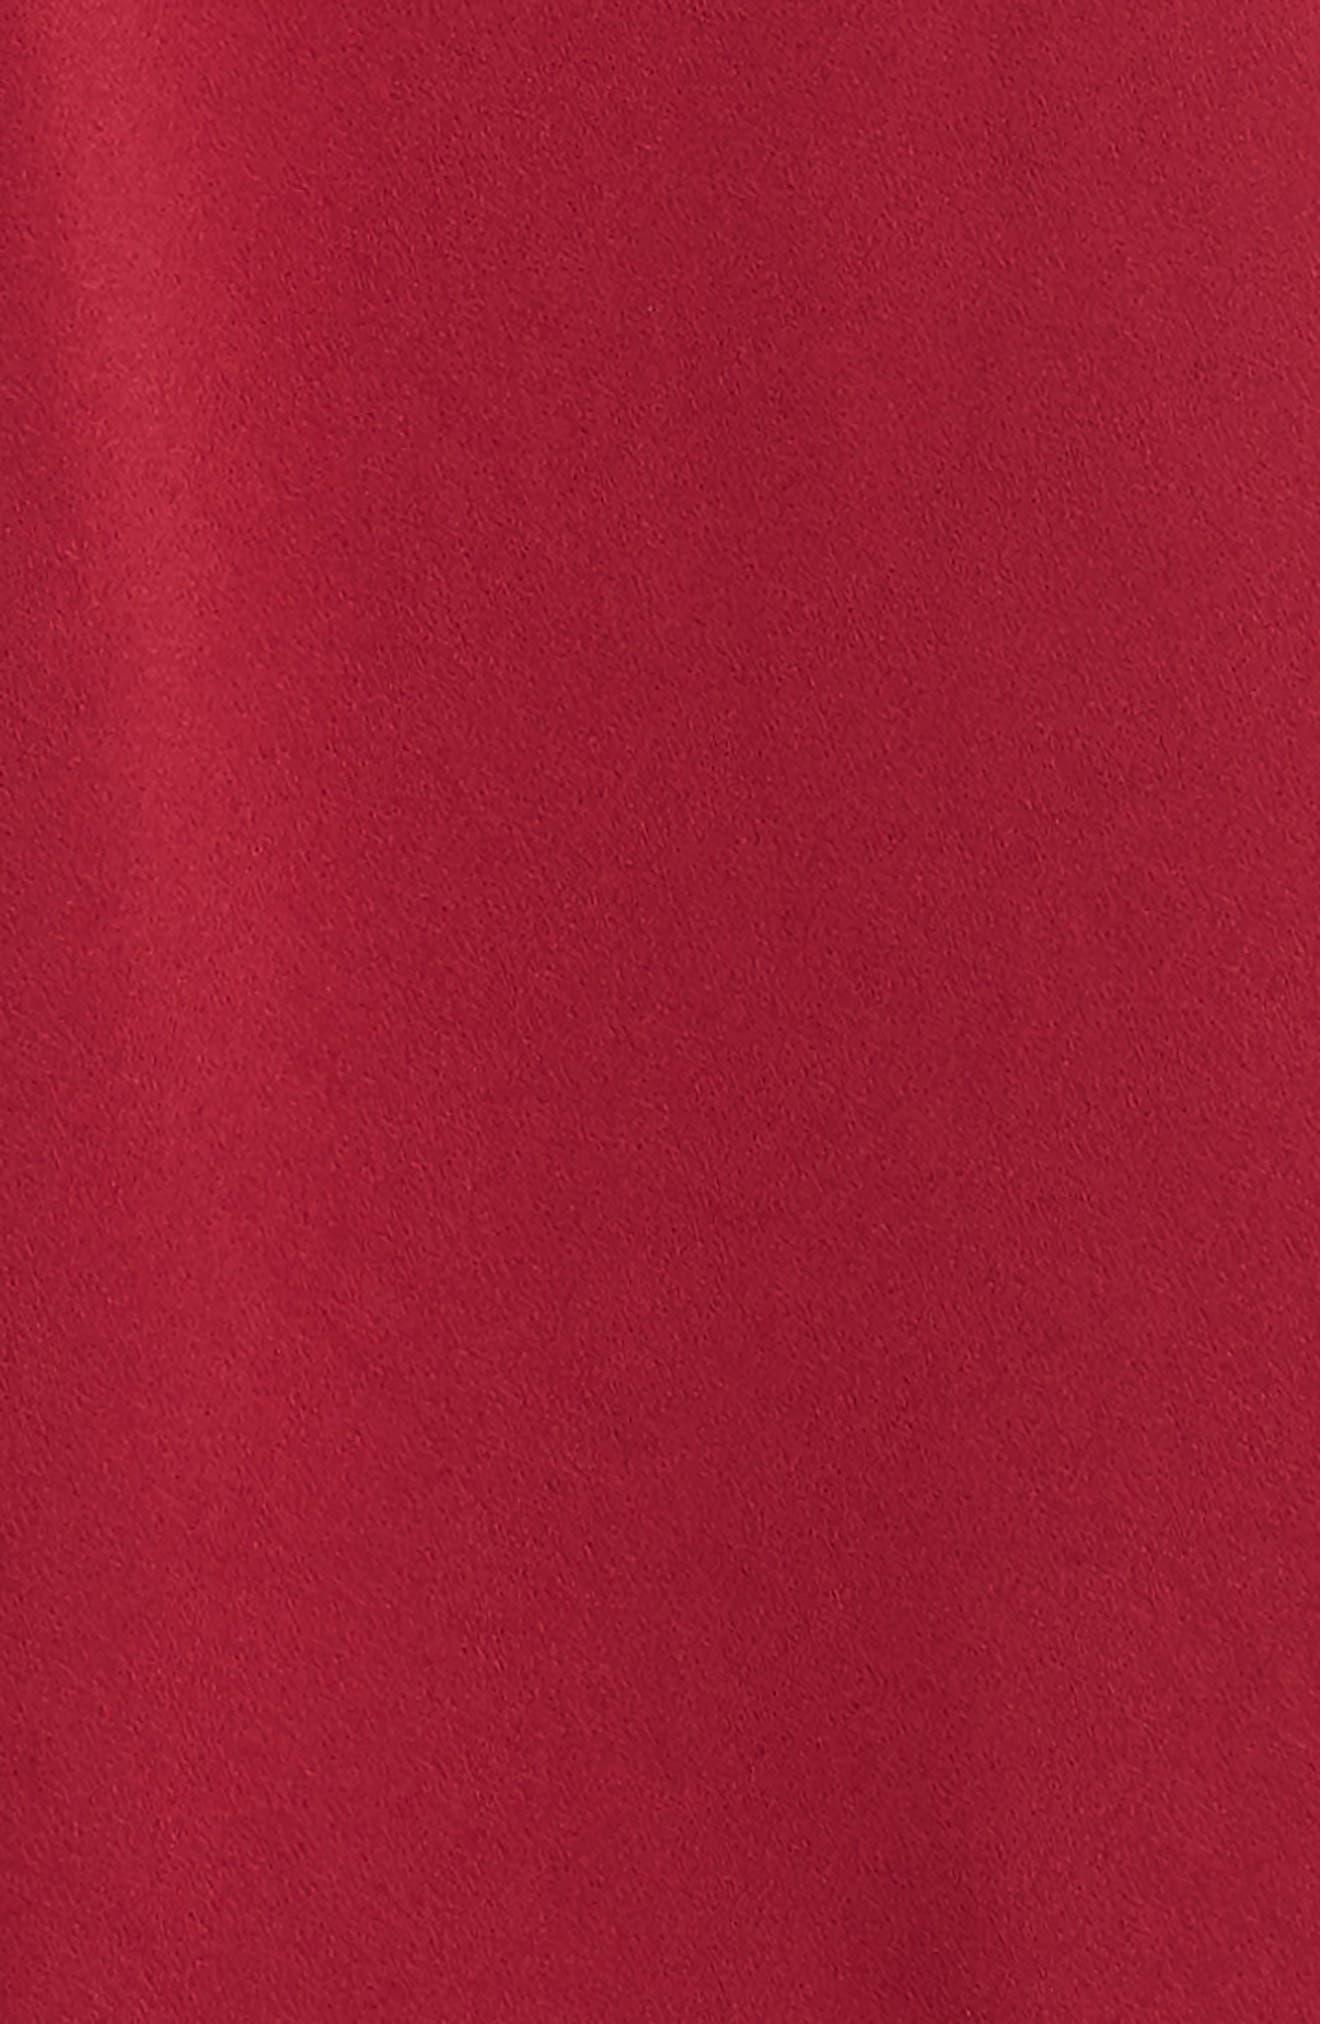 Point Collar Dress,                             Alternate thumbnail 3, color,                             Burgundy